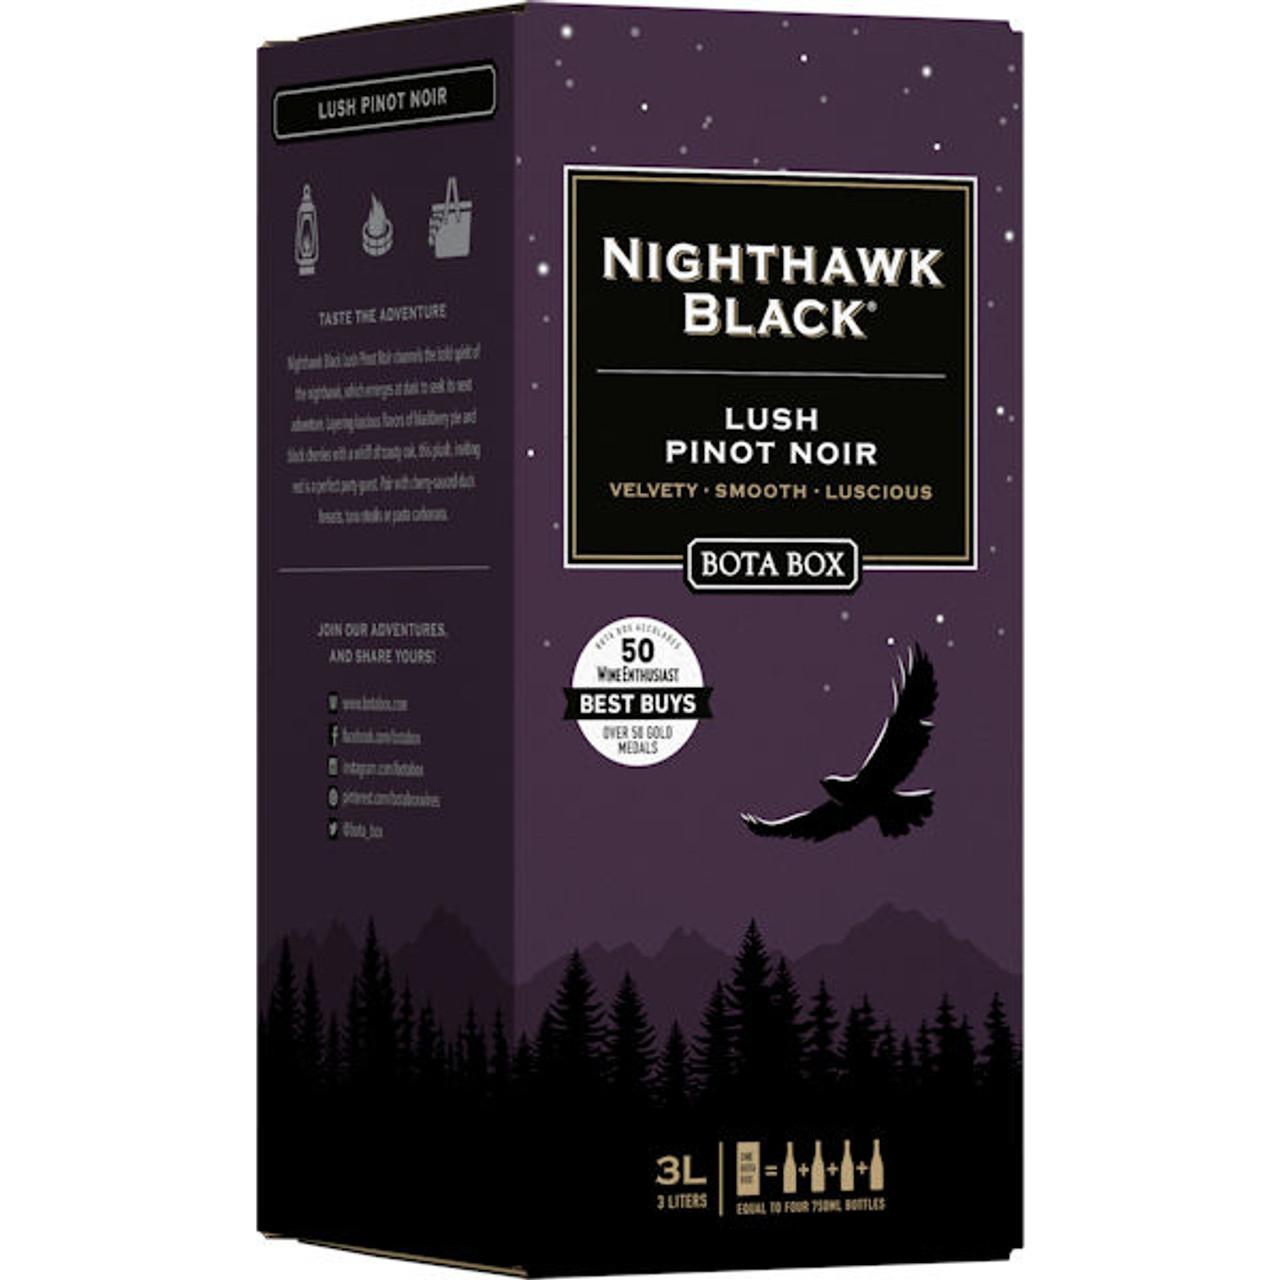 Bota Box Nighthawk Black Lush Pinot Noir 3L